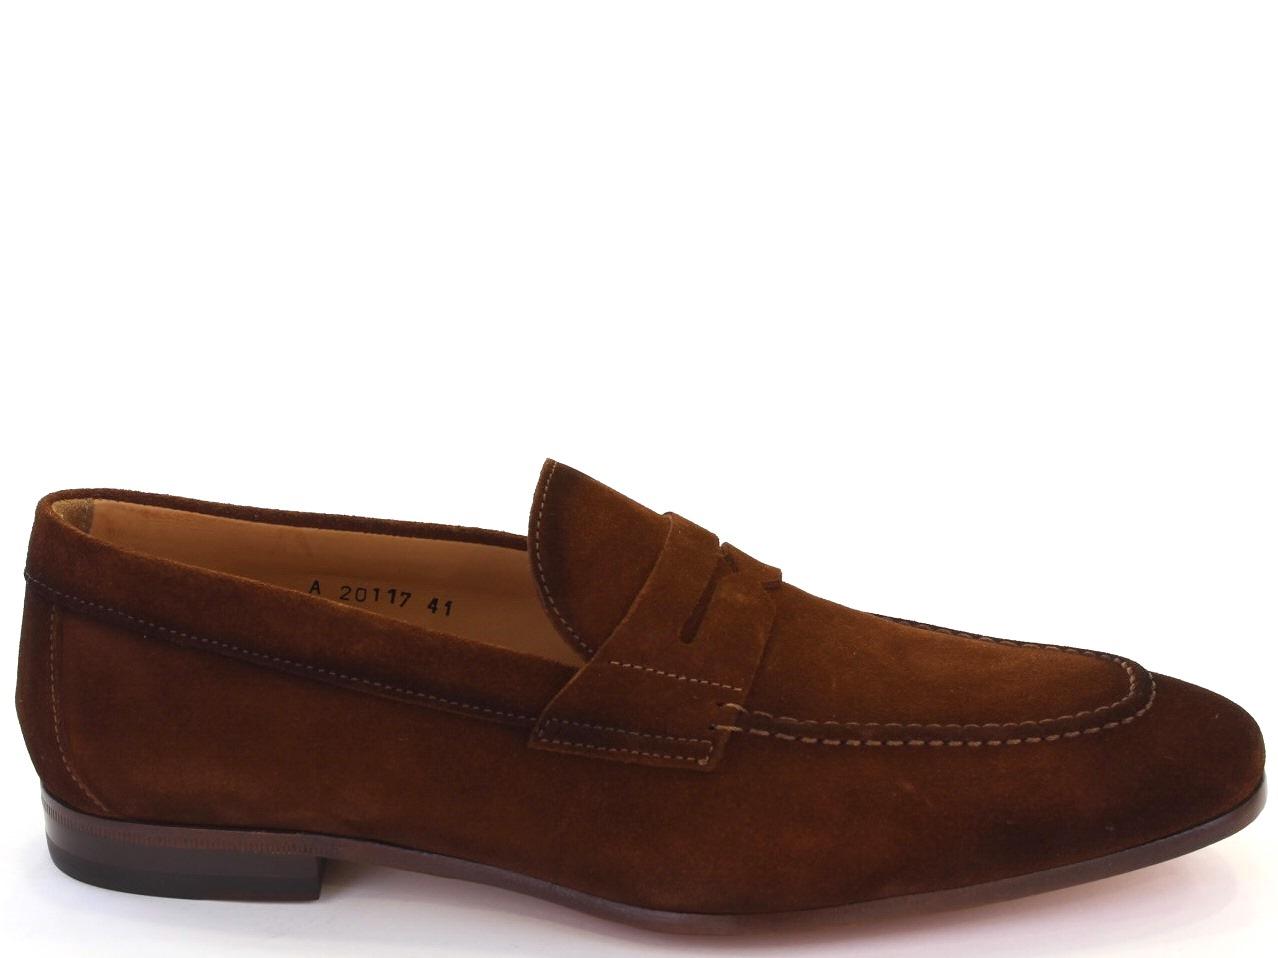 Slip-on Shoes Gino Bianchi - 405 A20117